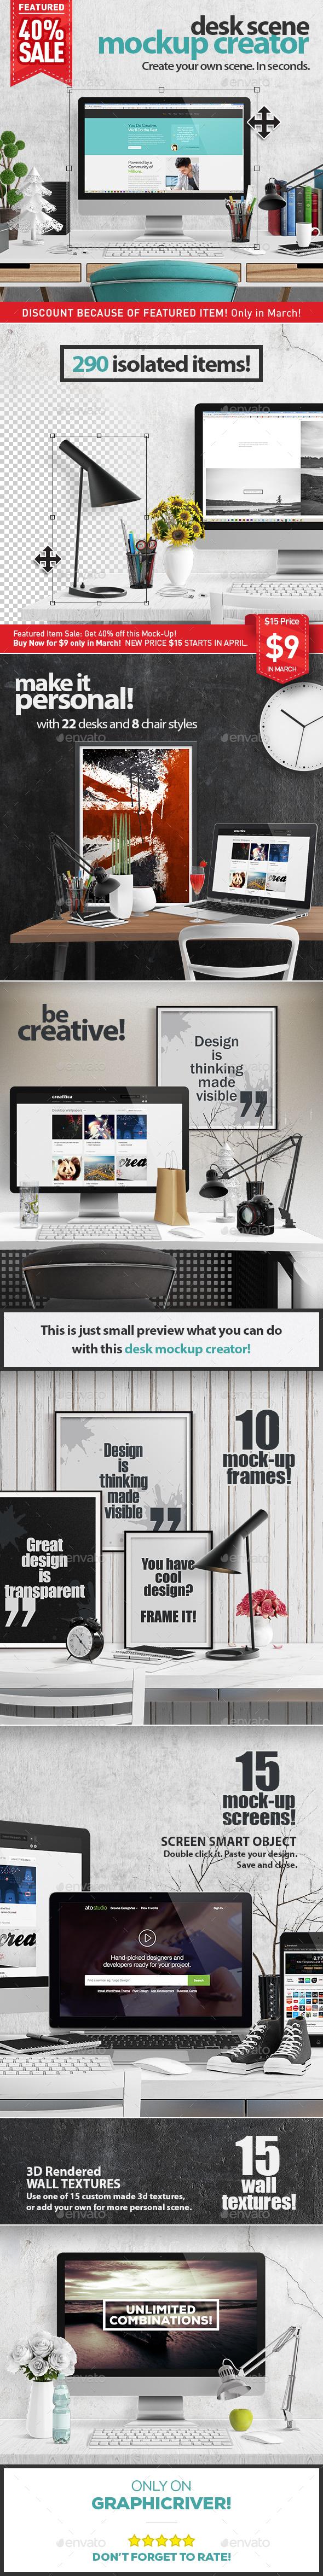 Desk Scene Mock-Up Creator - Hero Images Graphics